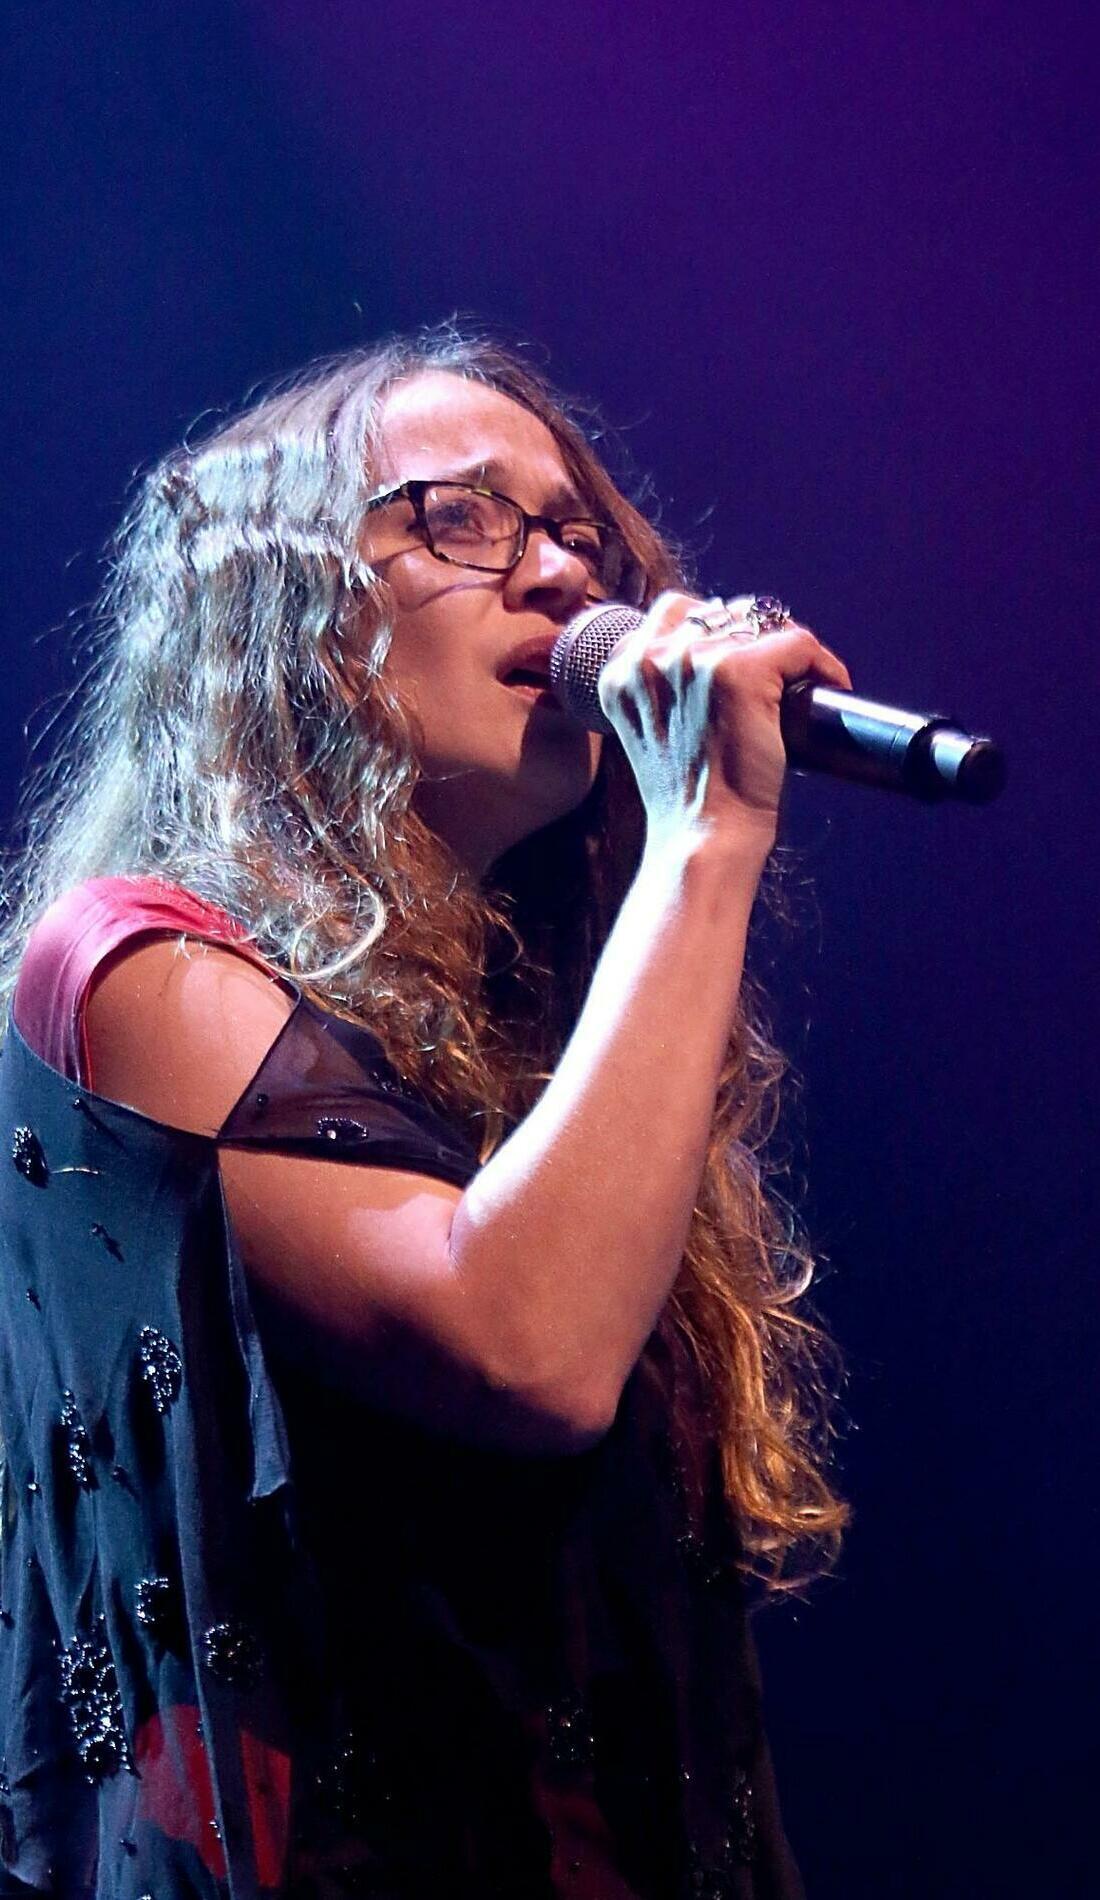 A Fiona Apple live event